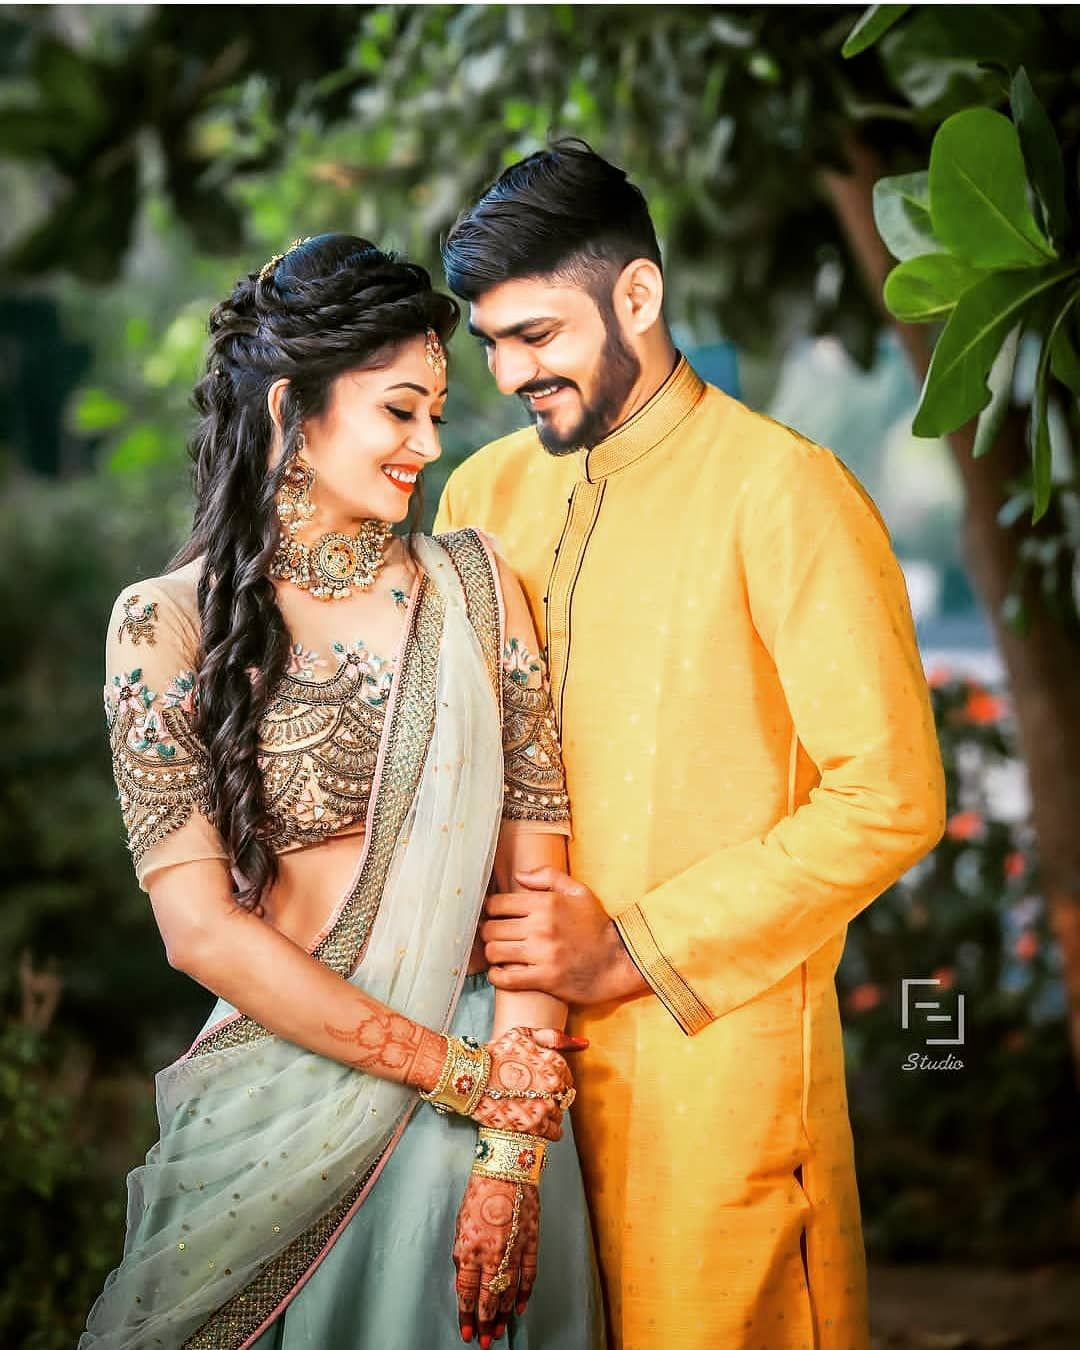 Dahudlod Wedding couple poses photography, Indian